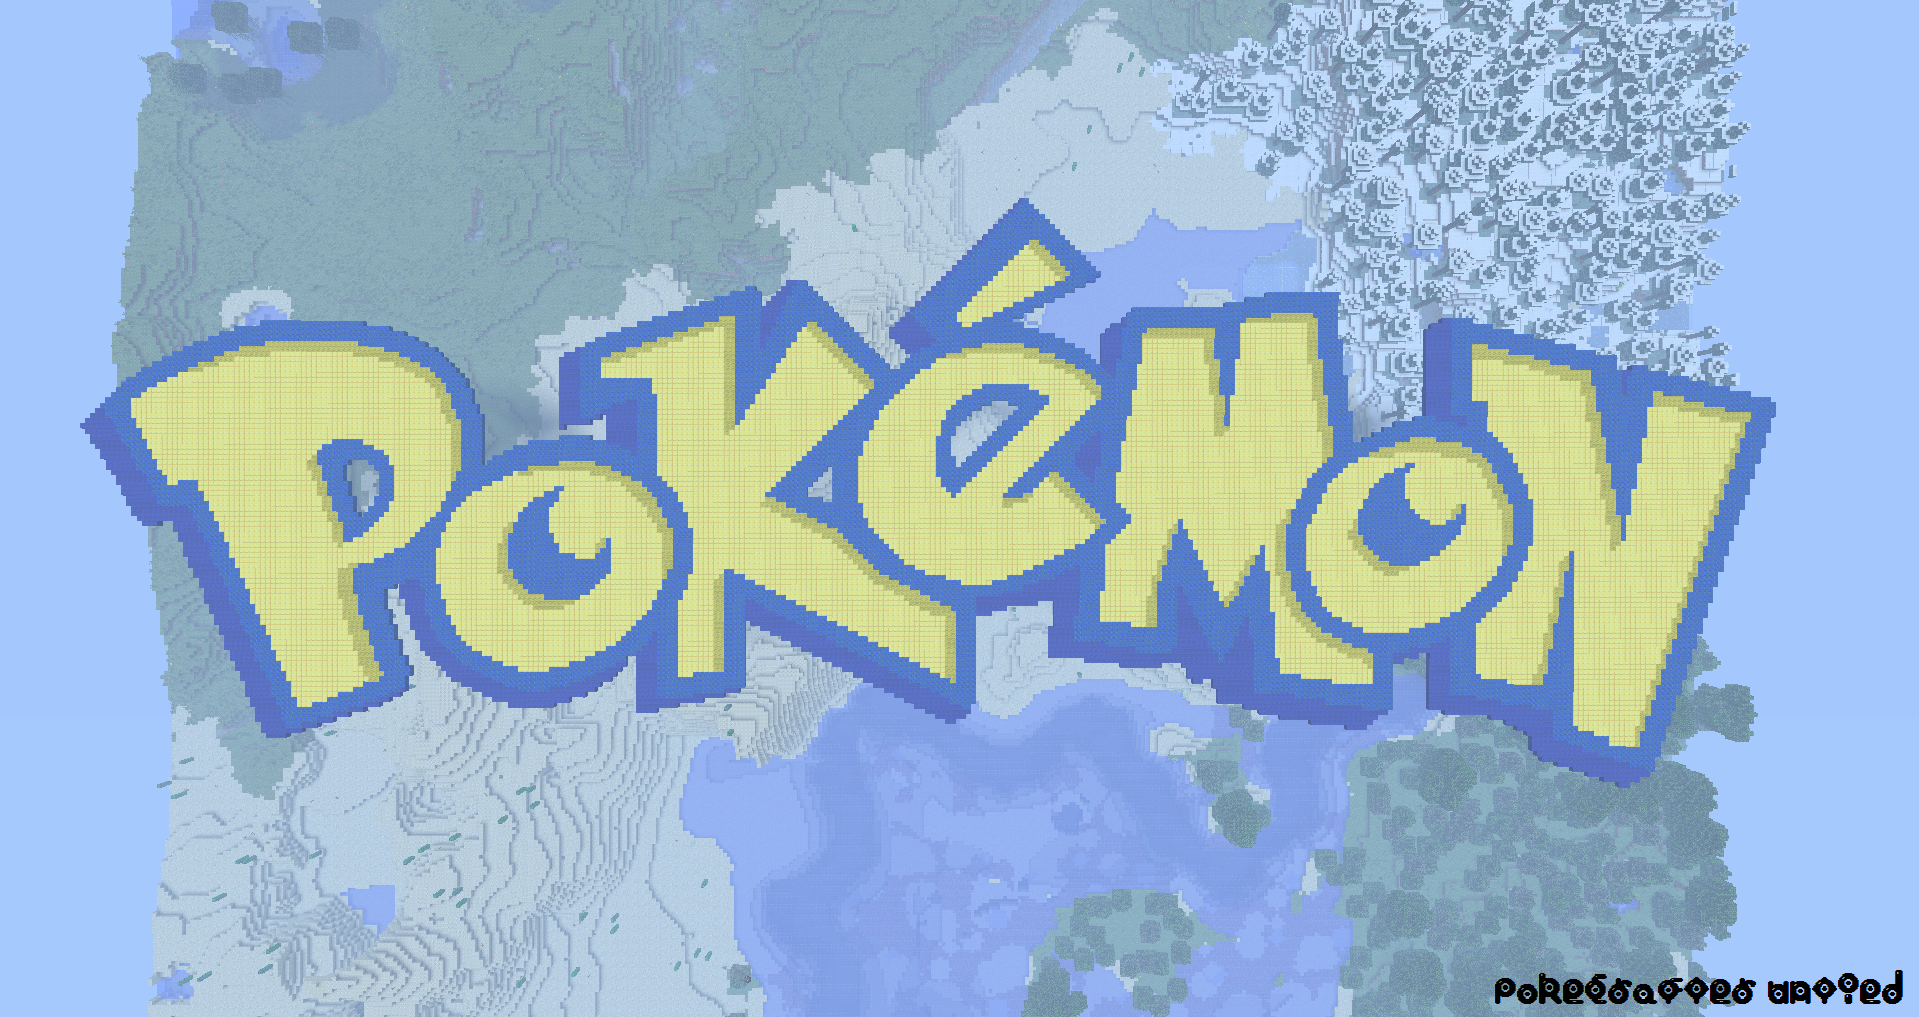 Pokemon logo in minecraft big enough by pkmnmc on - Pokemon logo minecraft ...